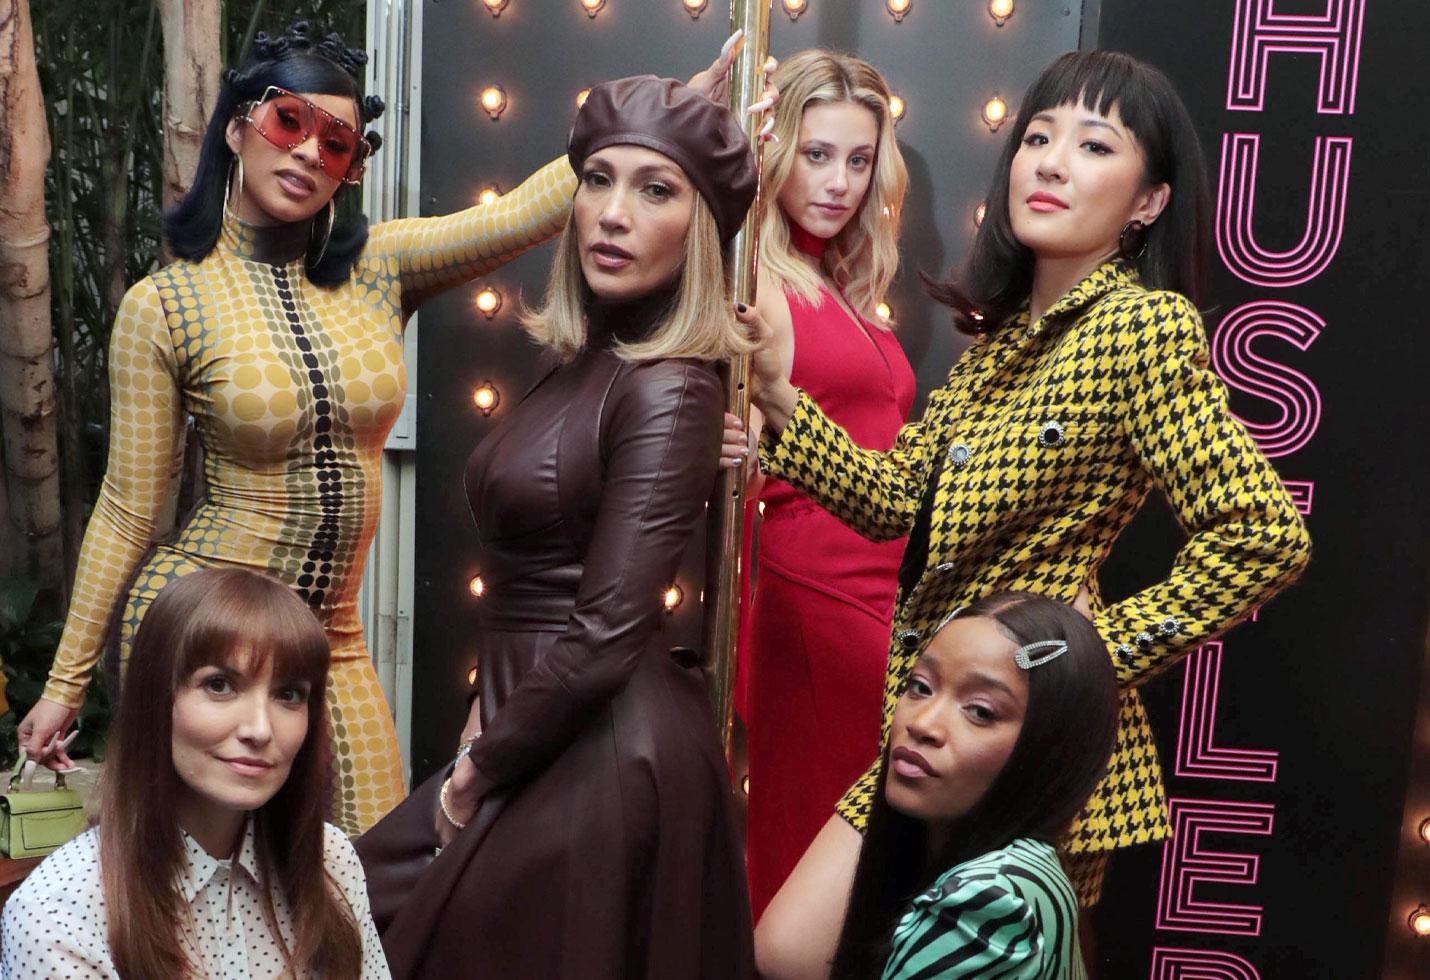 Writer/Director Lorene Scafaria, Cardi B, Jennifer Lopez, Lili Reinhart, Constance Wu and Keke Palmer